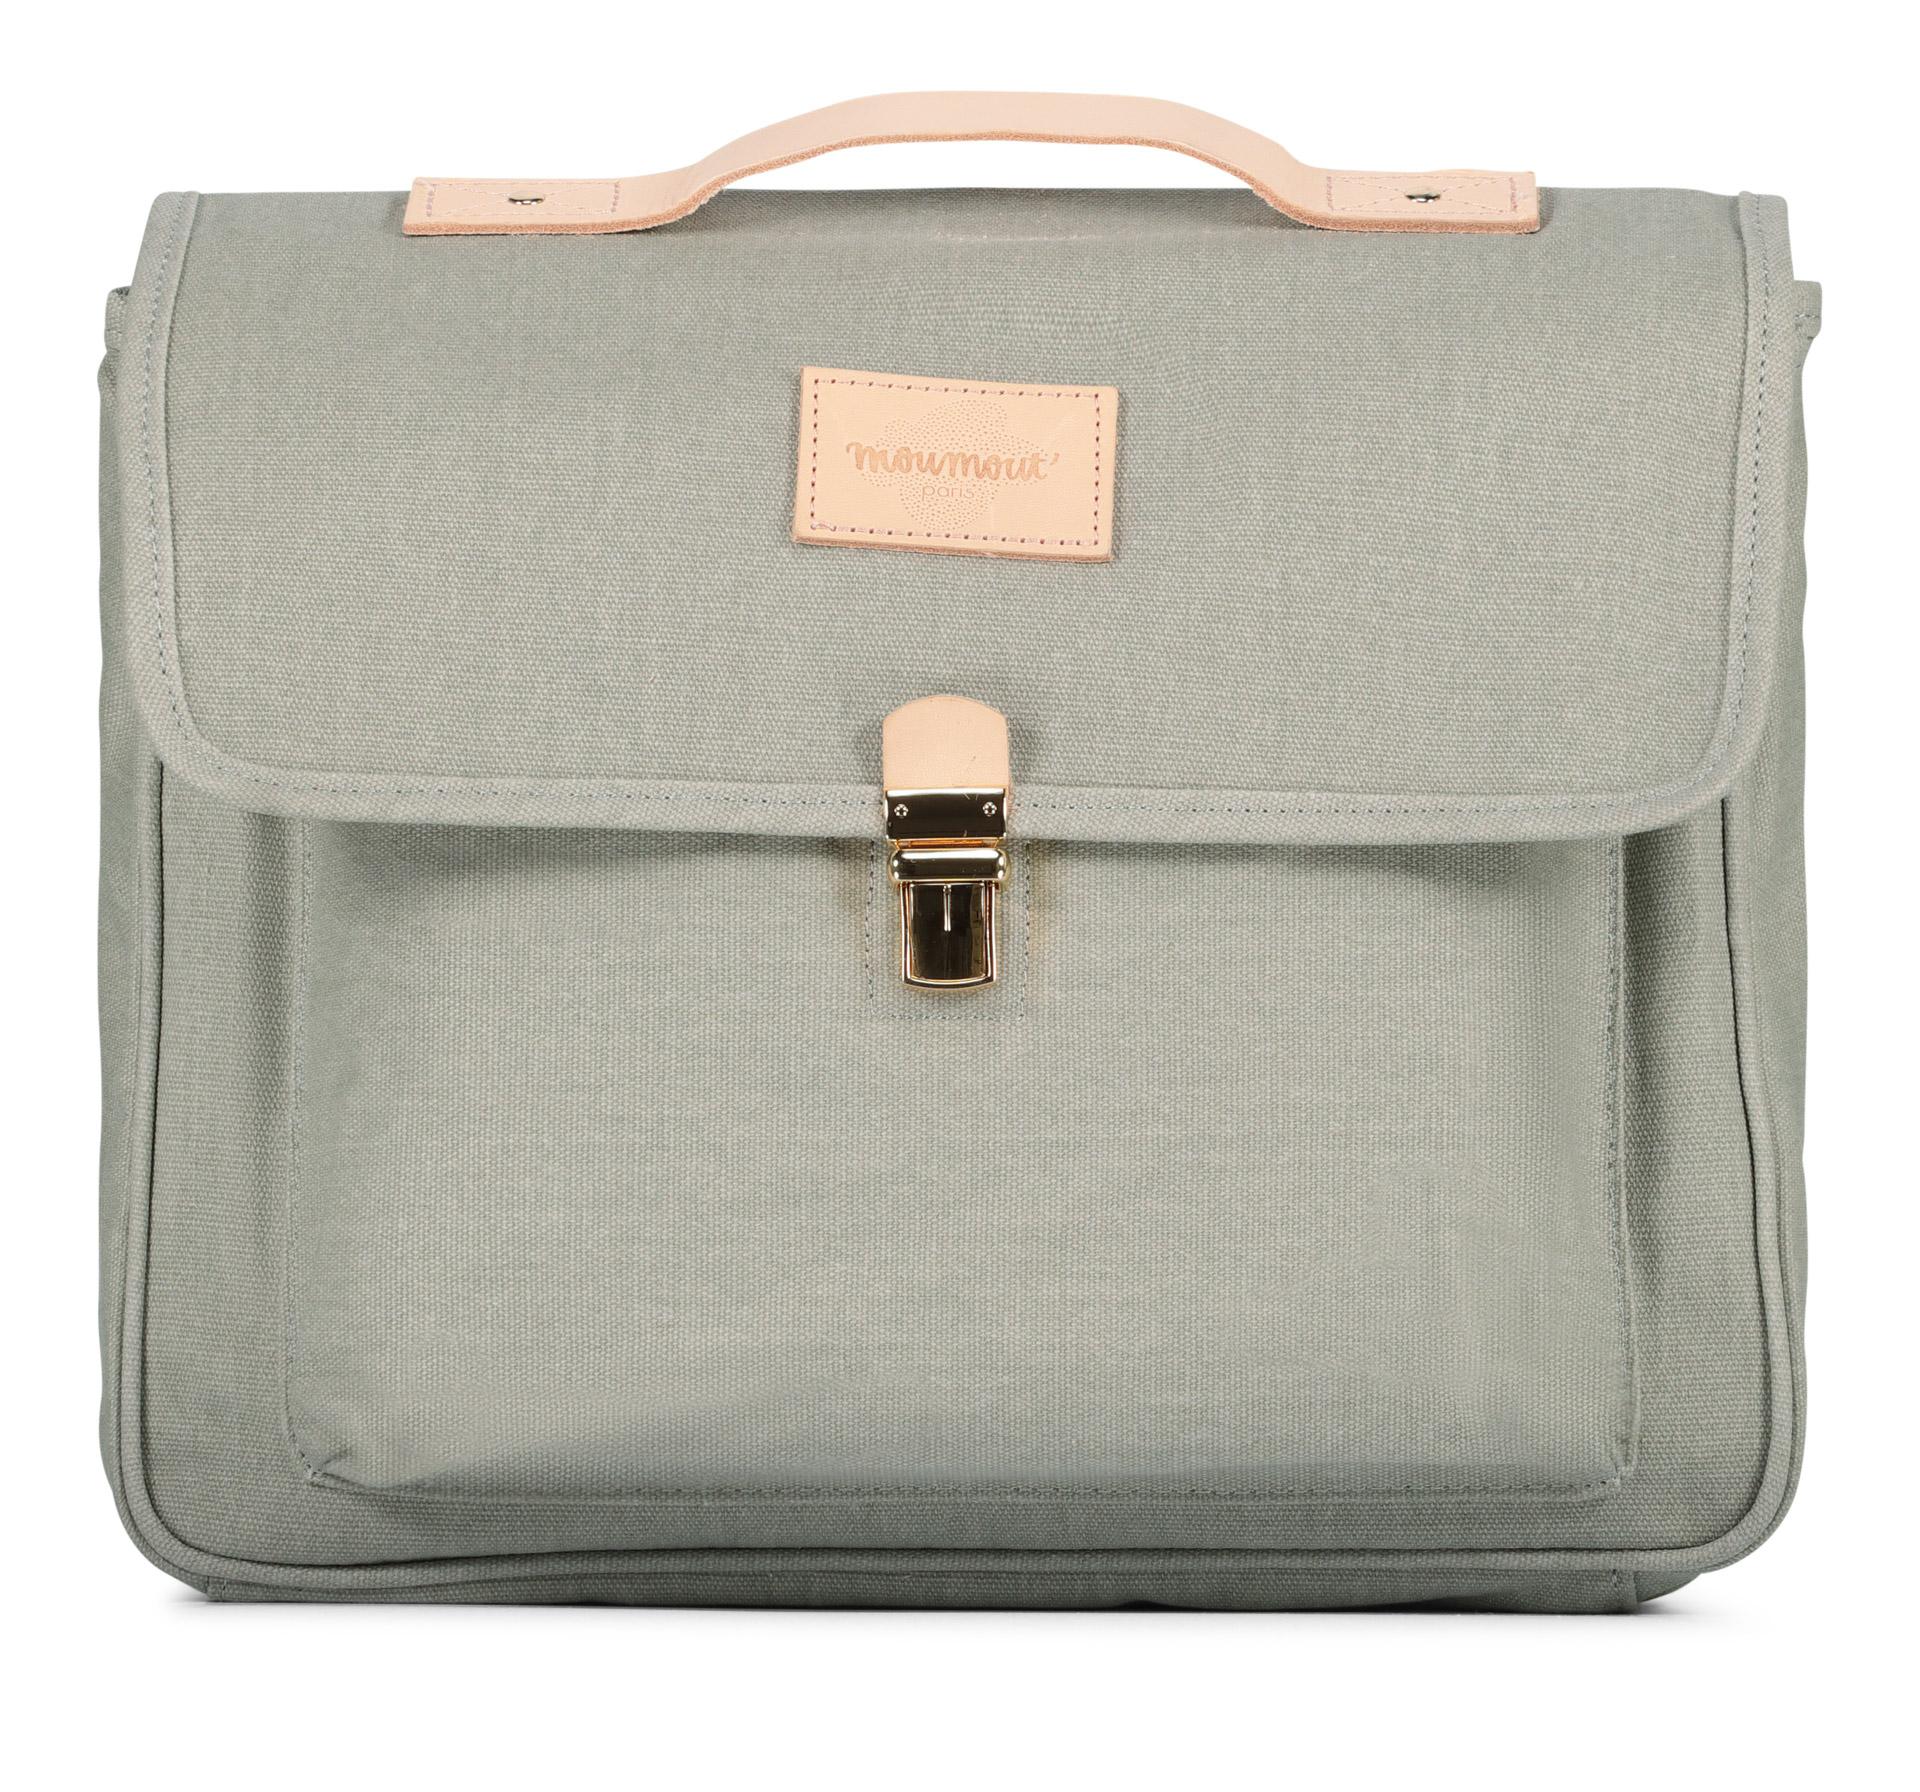 Serge Cartable Cartable Schoolbag Serge Schoolbag Serge Schoolbag Cartable Cartable Serge SqRHYH